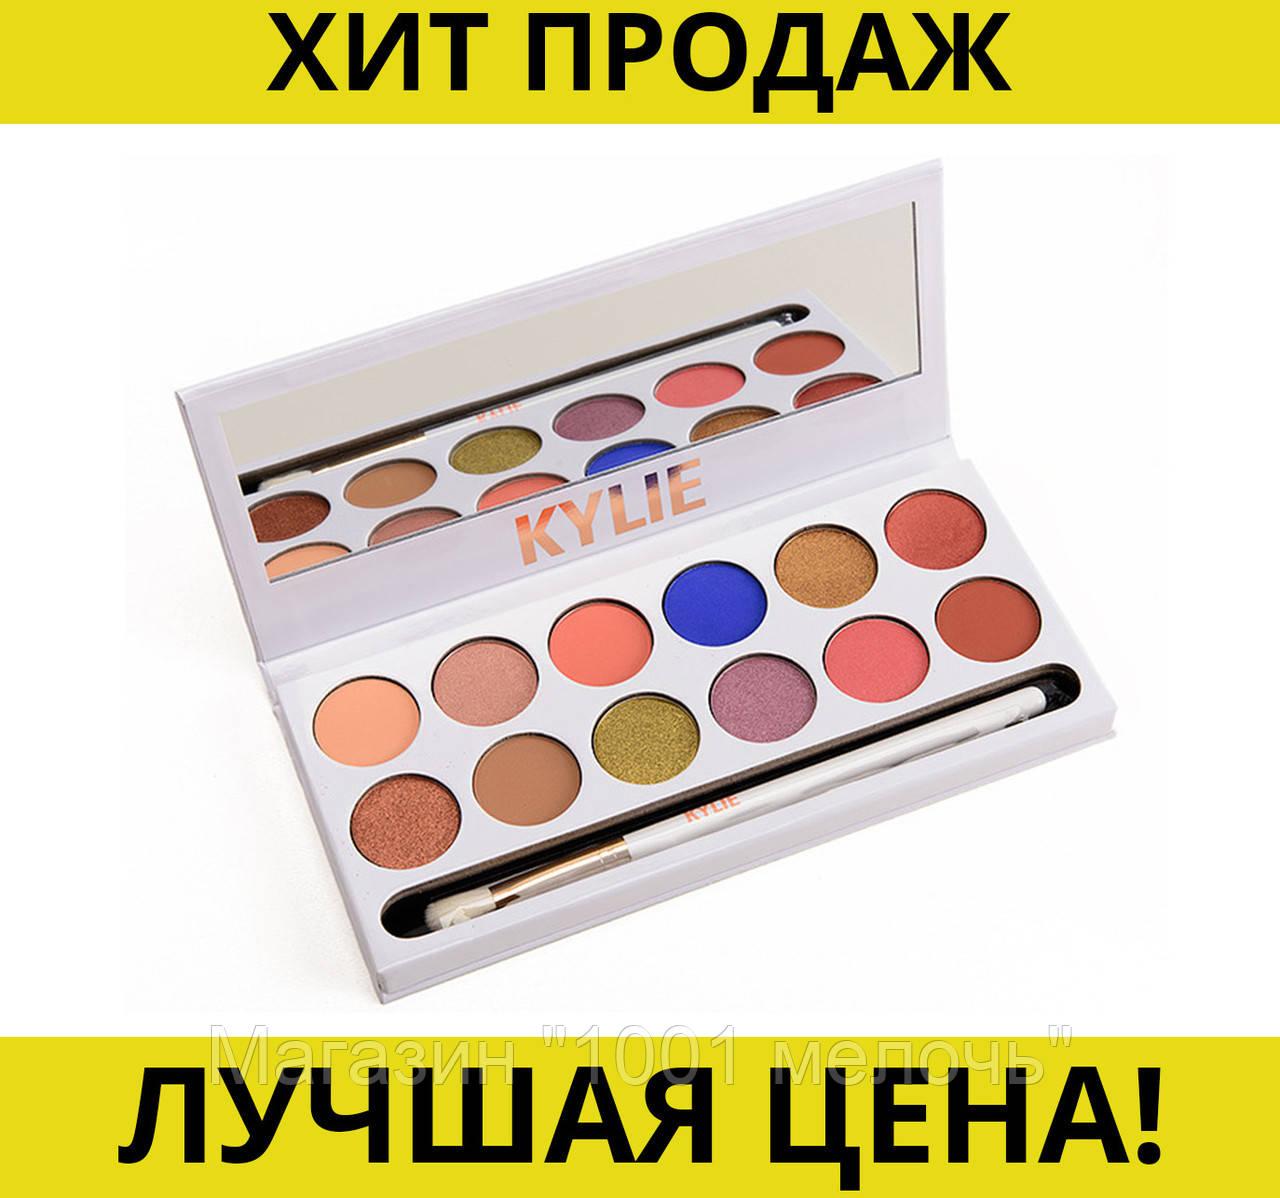 Палетка теней для глаз в стиле Kyshadow THE ROYAL PEACH PALETTE- Новинка